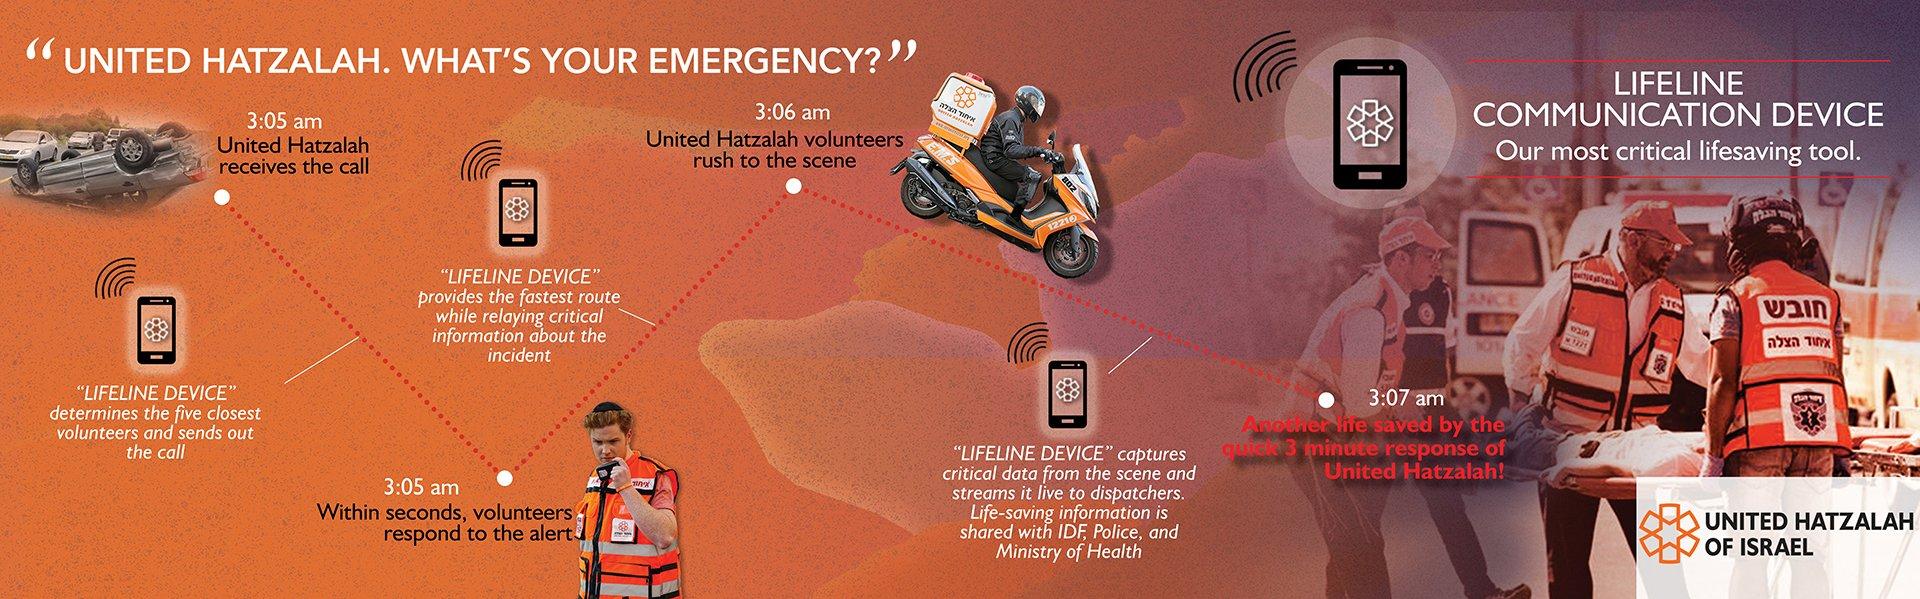 Join United Hatzalah in Saving Lives